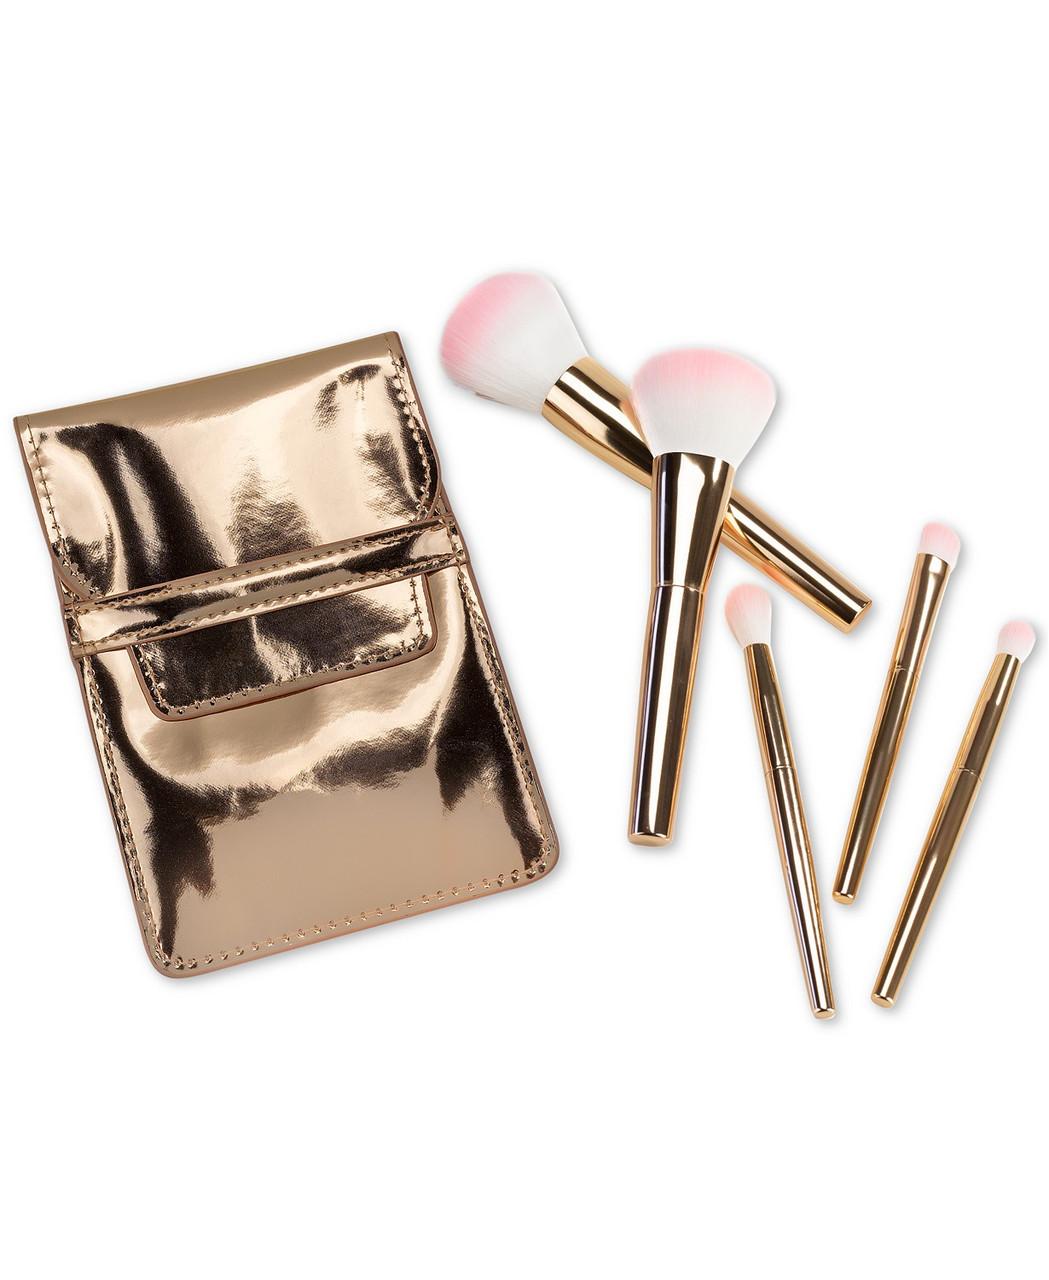 Glitterati Culture Набор кистей для макияжа - Е2